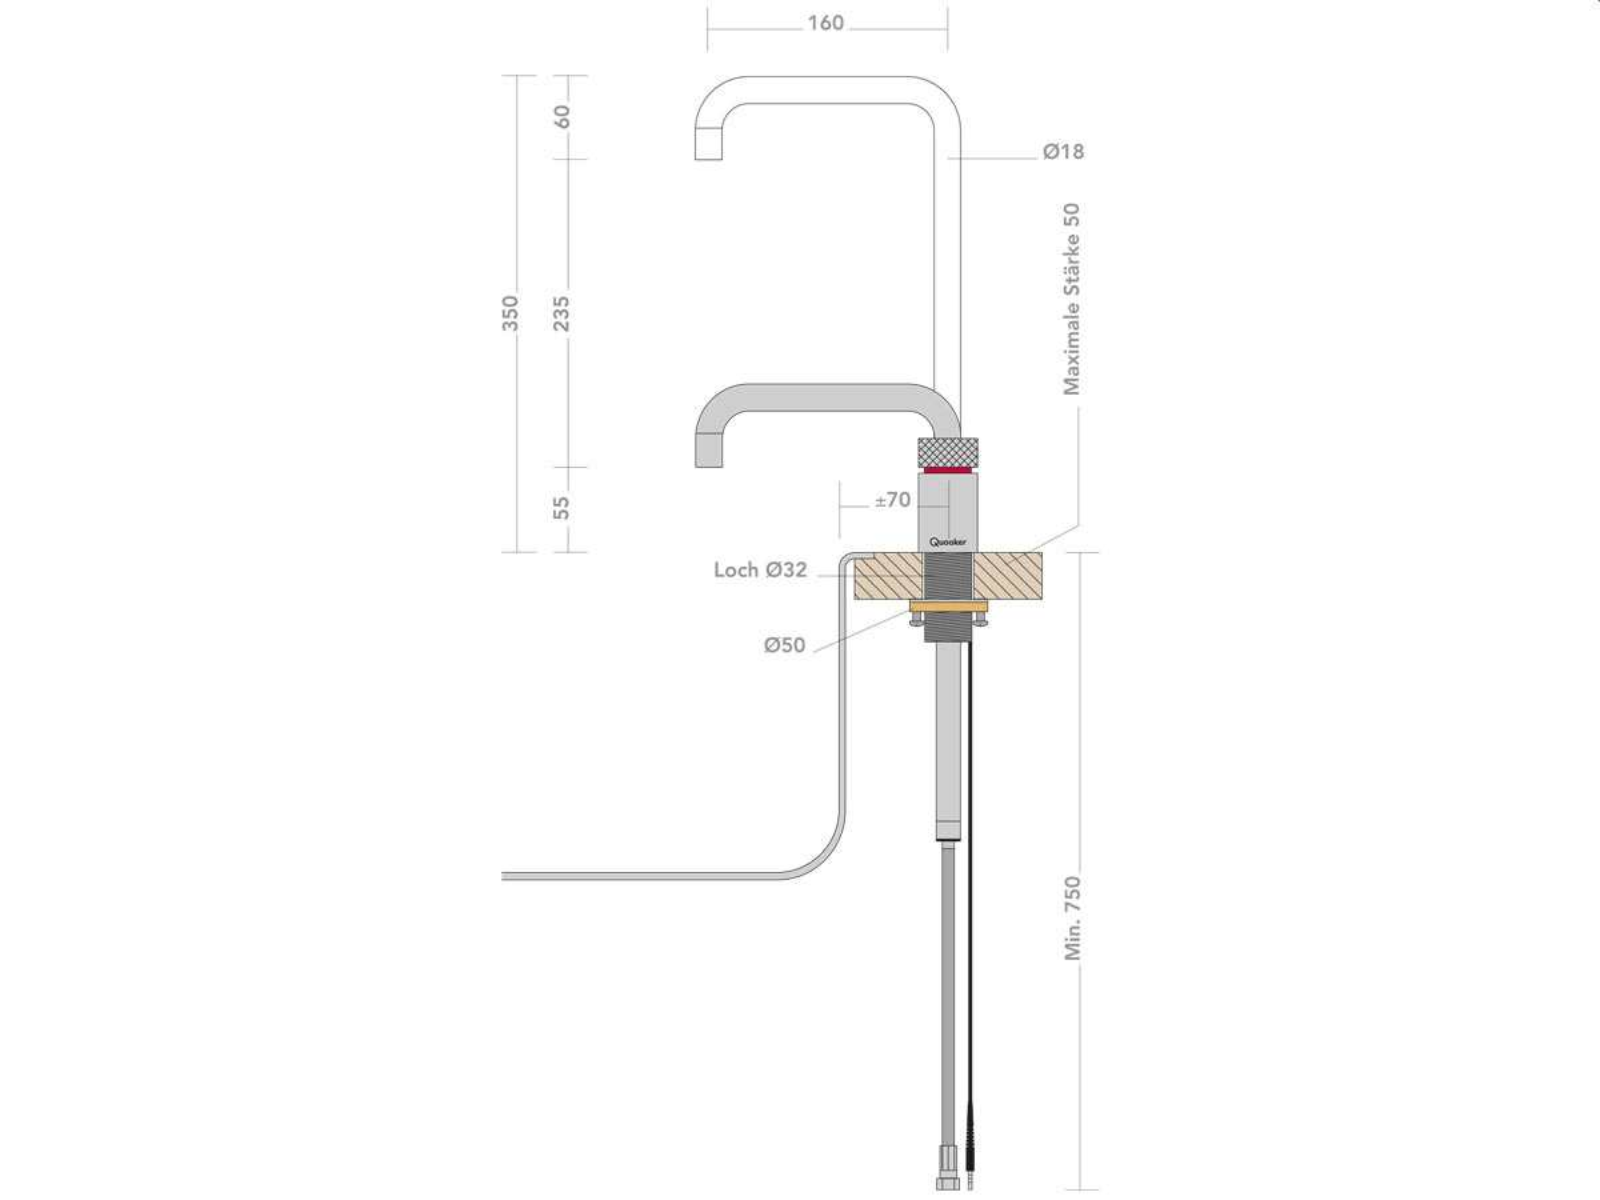 Quooker COMBI 2.2 E & CUBE | Nordic Square RVS (Voll-Edelstahl)